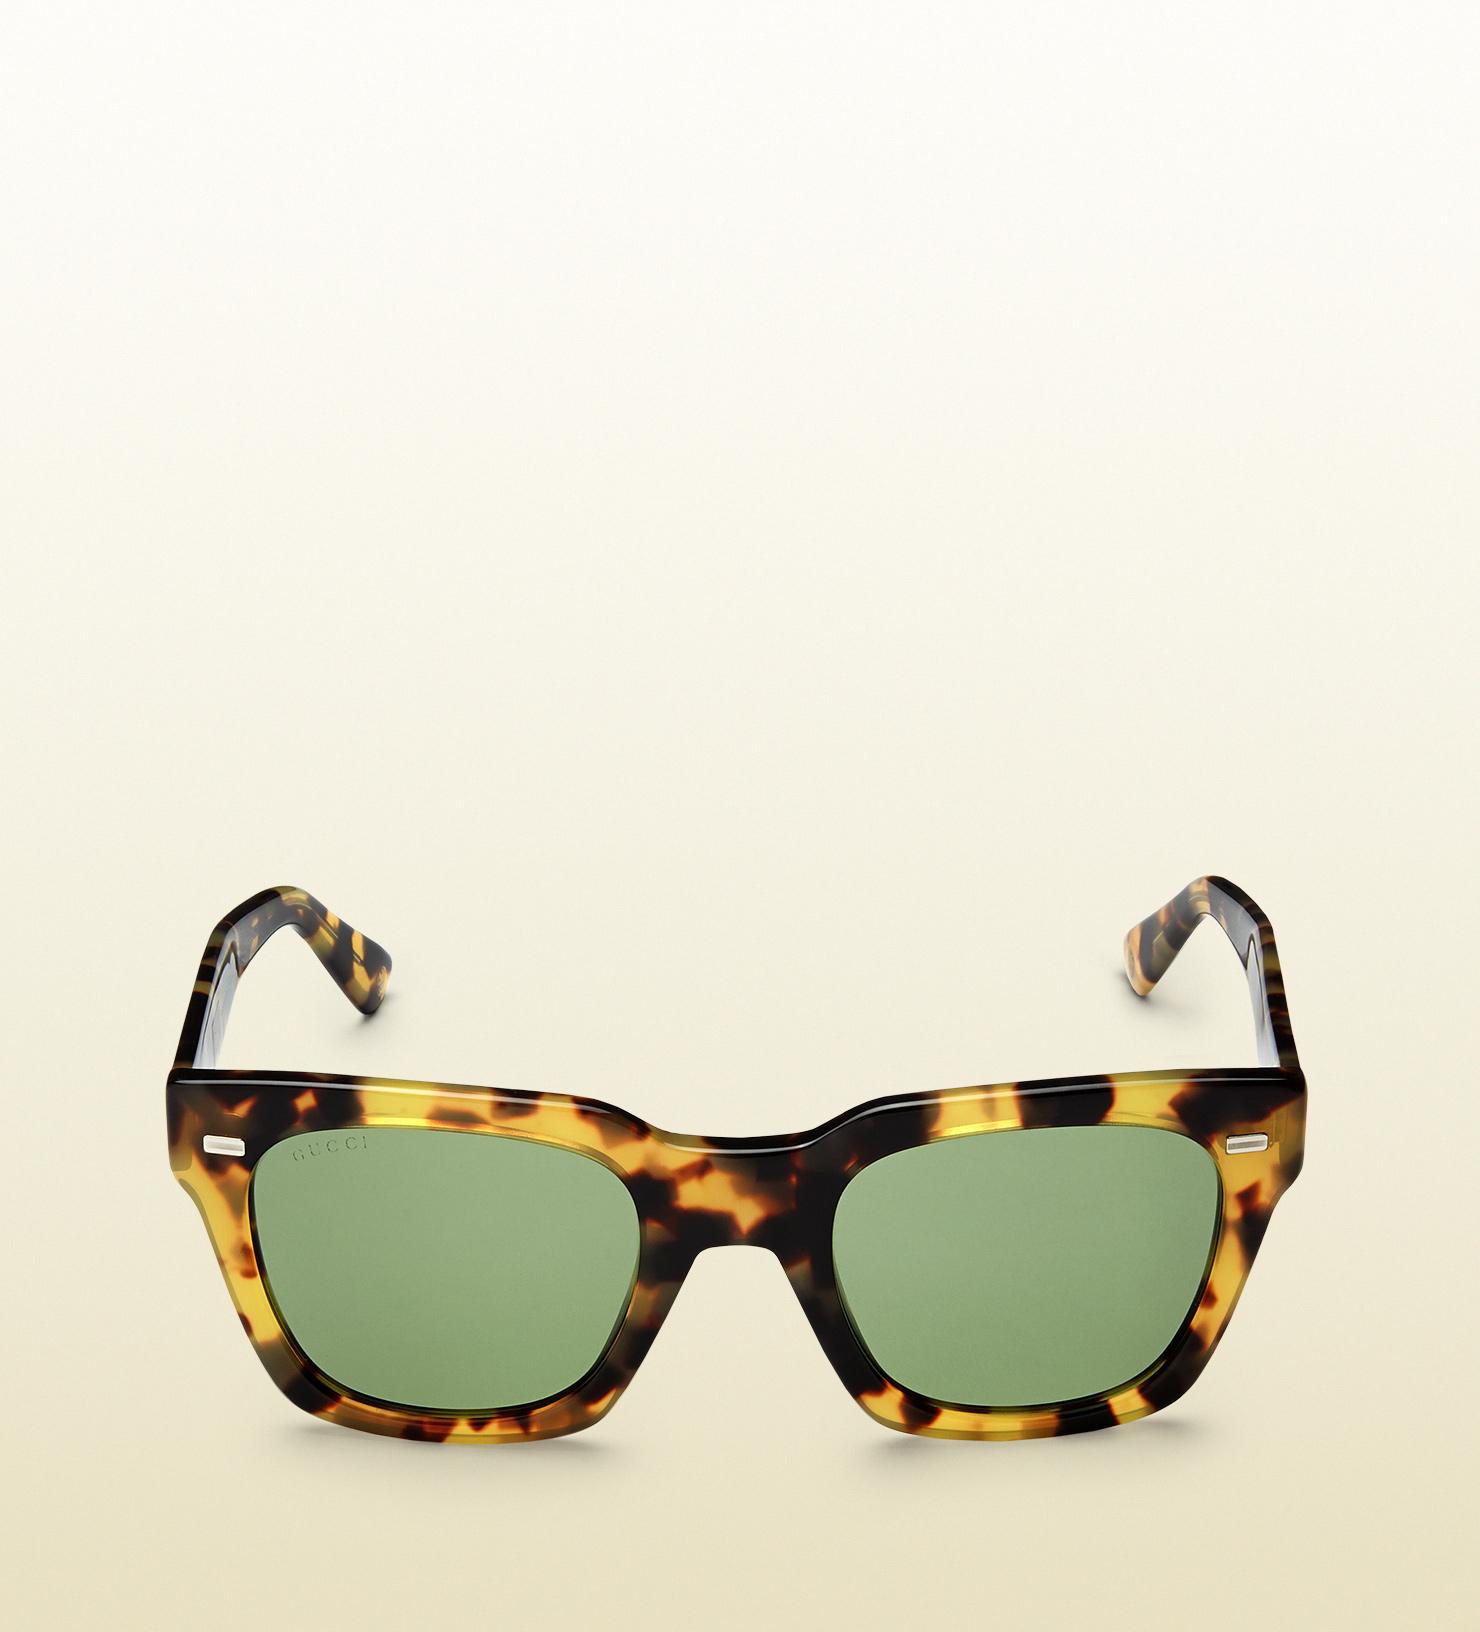 fb37187cc5d Gallery. Women s Saint Laurent Bold Women s Mirrored Sunglasses ...